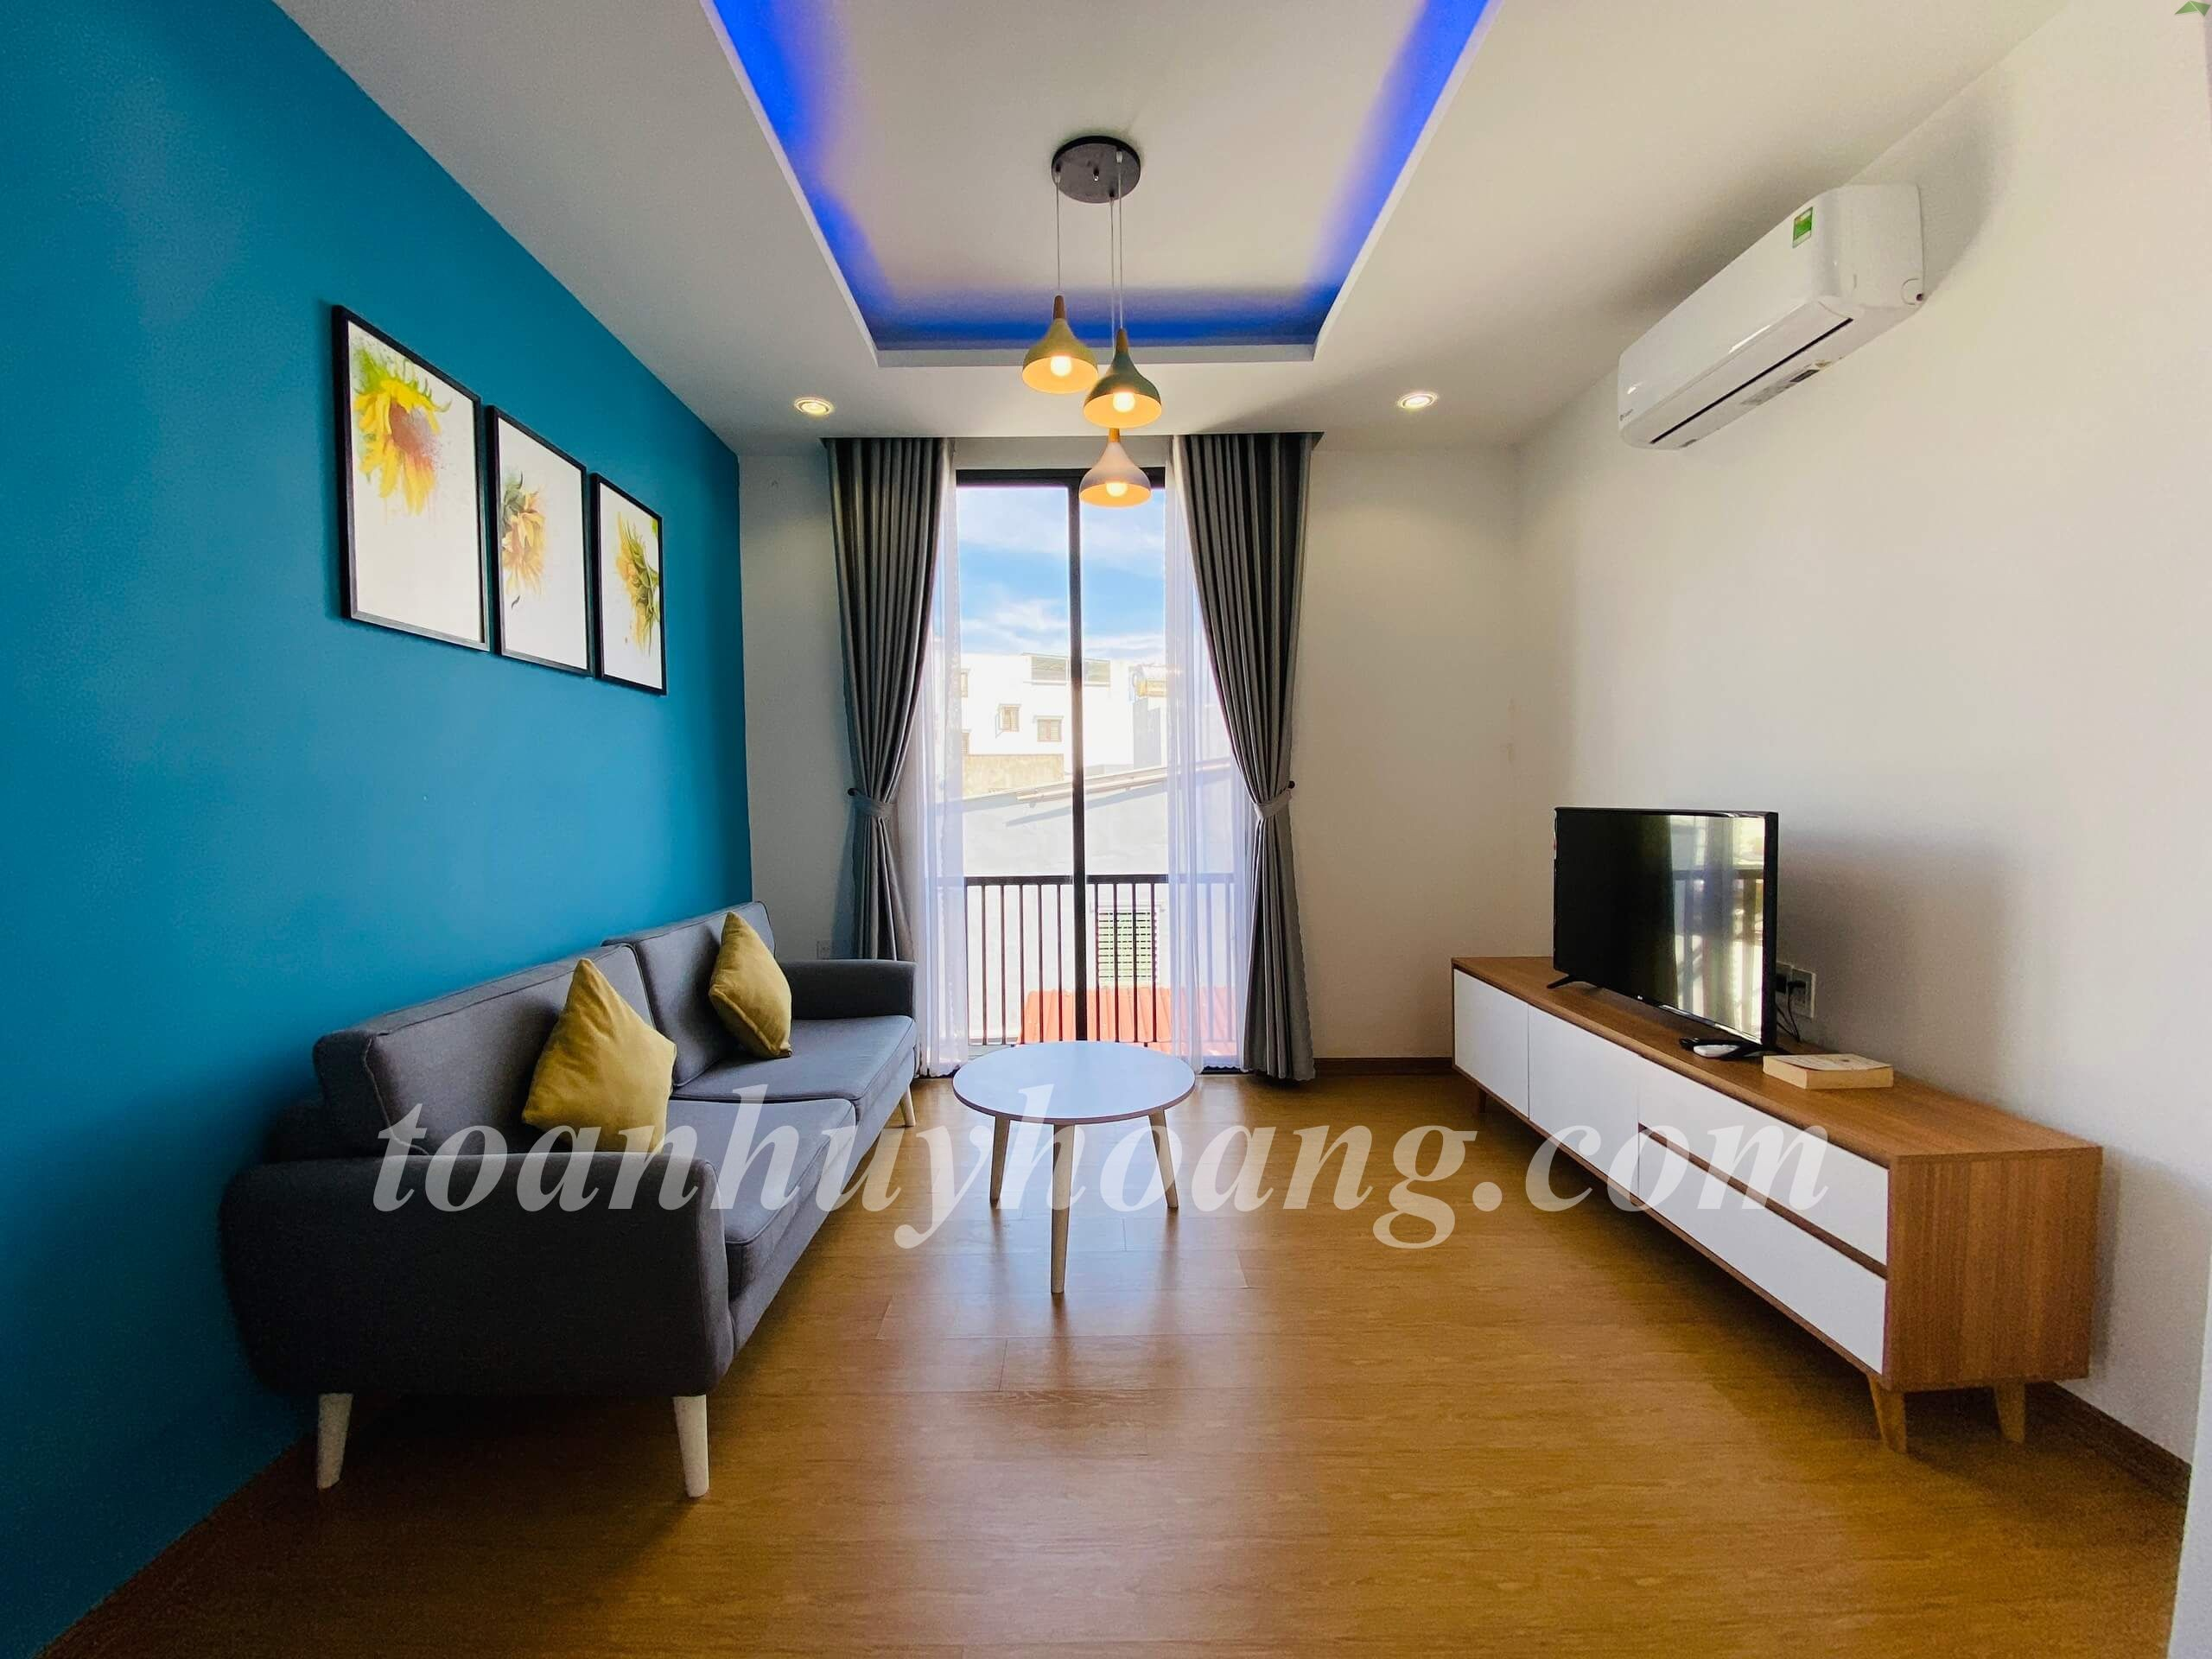 Căn Hộ Dịch Vụ 1 Phòng Ngủ | lovely one bedroom apartment